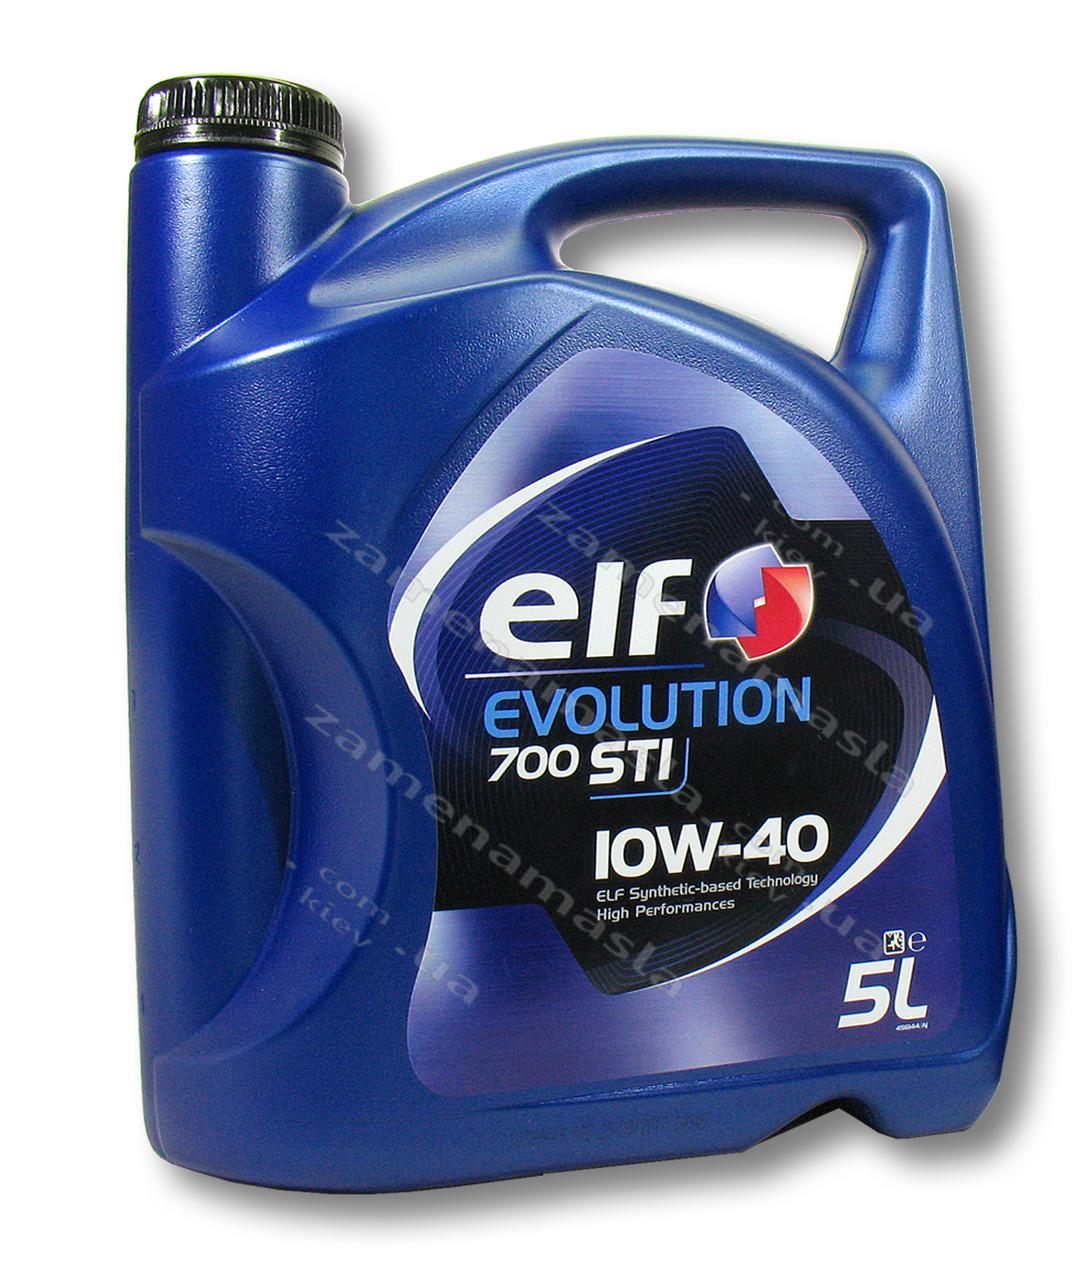 Elf Evolution 700 STI 10W40 5л - моторное масло